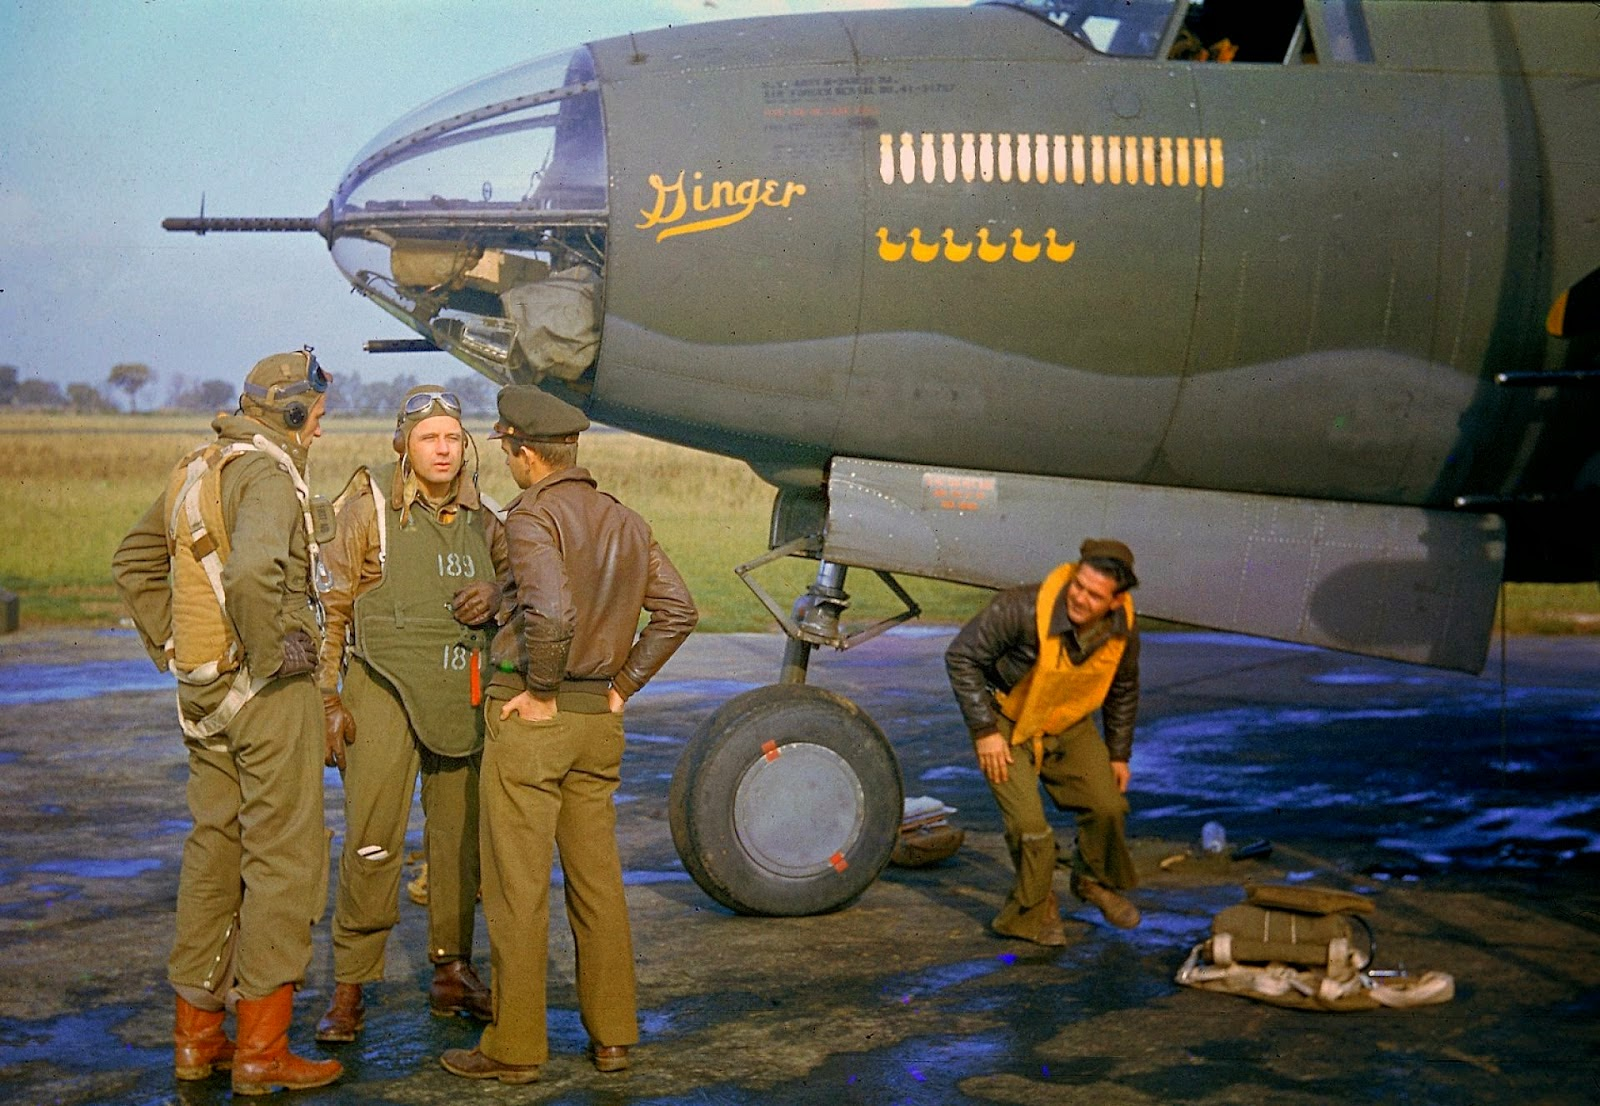 http://4.bp.blogspot.com/-9Wn3rdu5BoA/VLacQpEHyeI/AAAAAAABOMY/h07HYqIdLGQ/s1600/Rare+Color+Photographs+from+World+War+II+(6).jpg